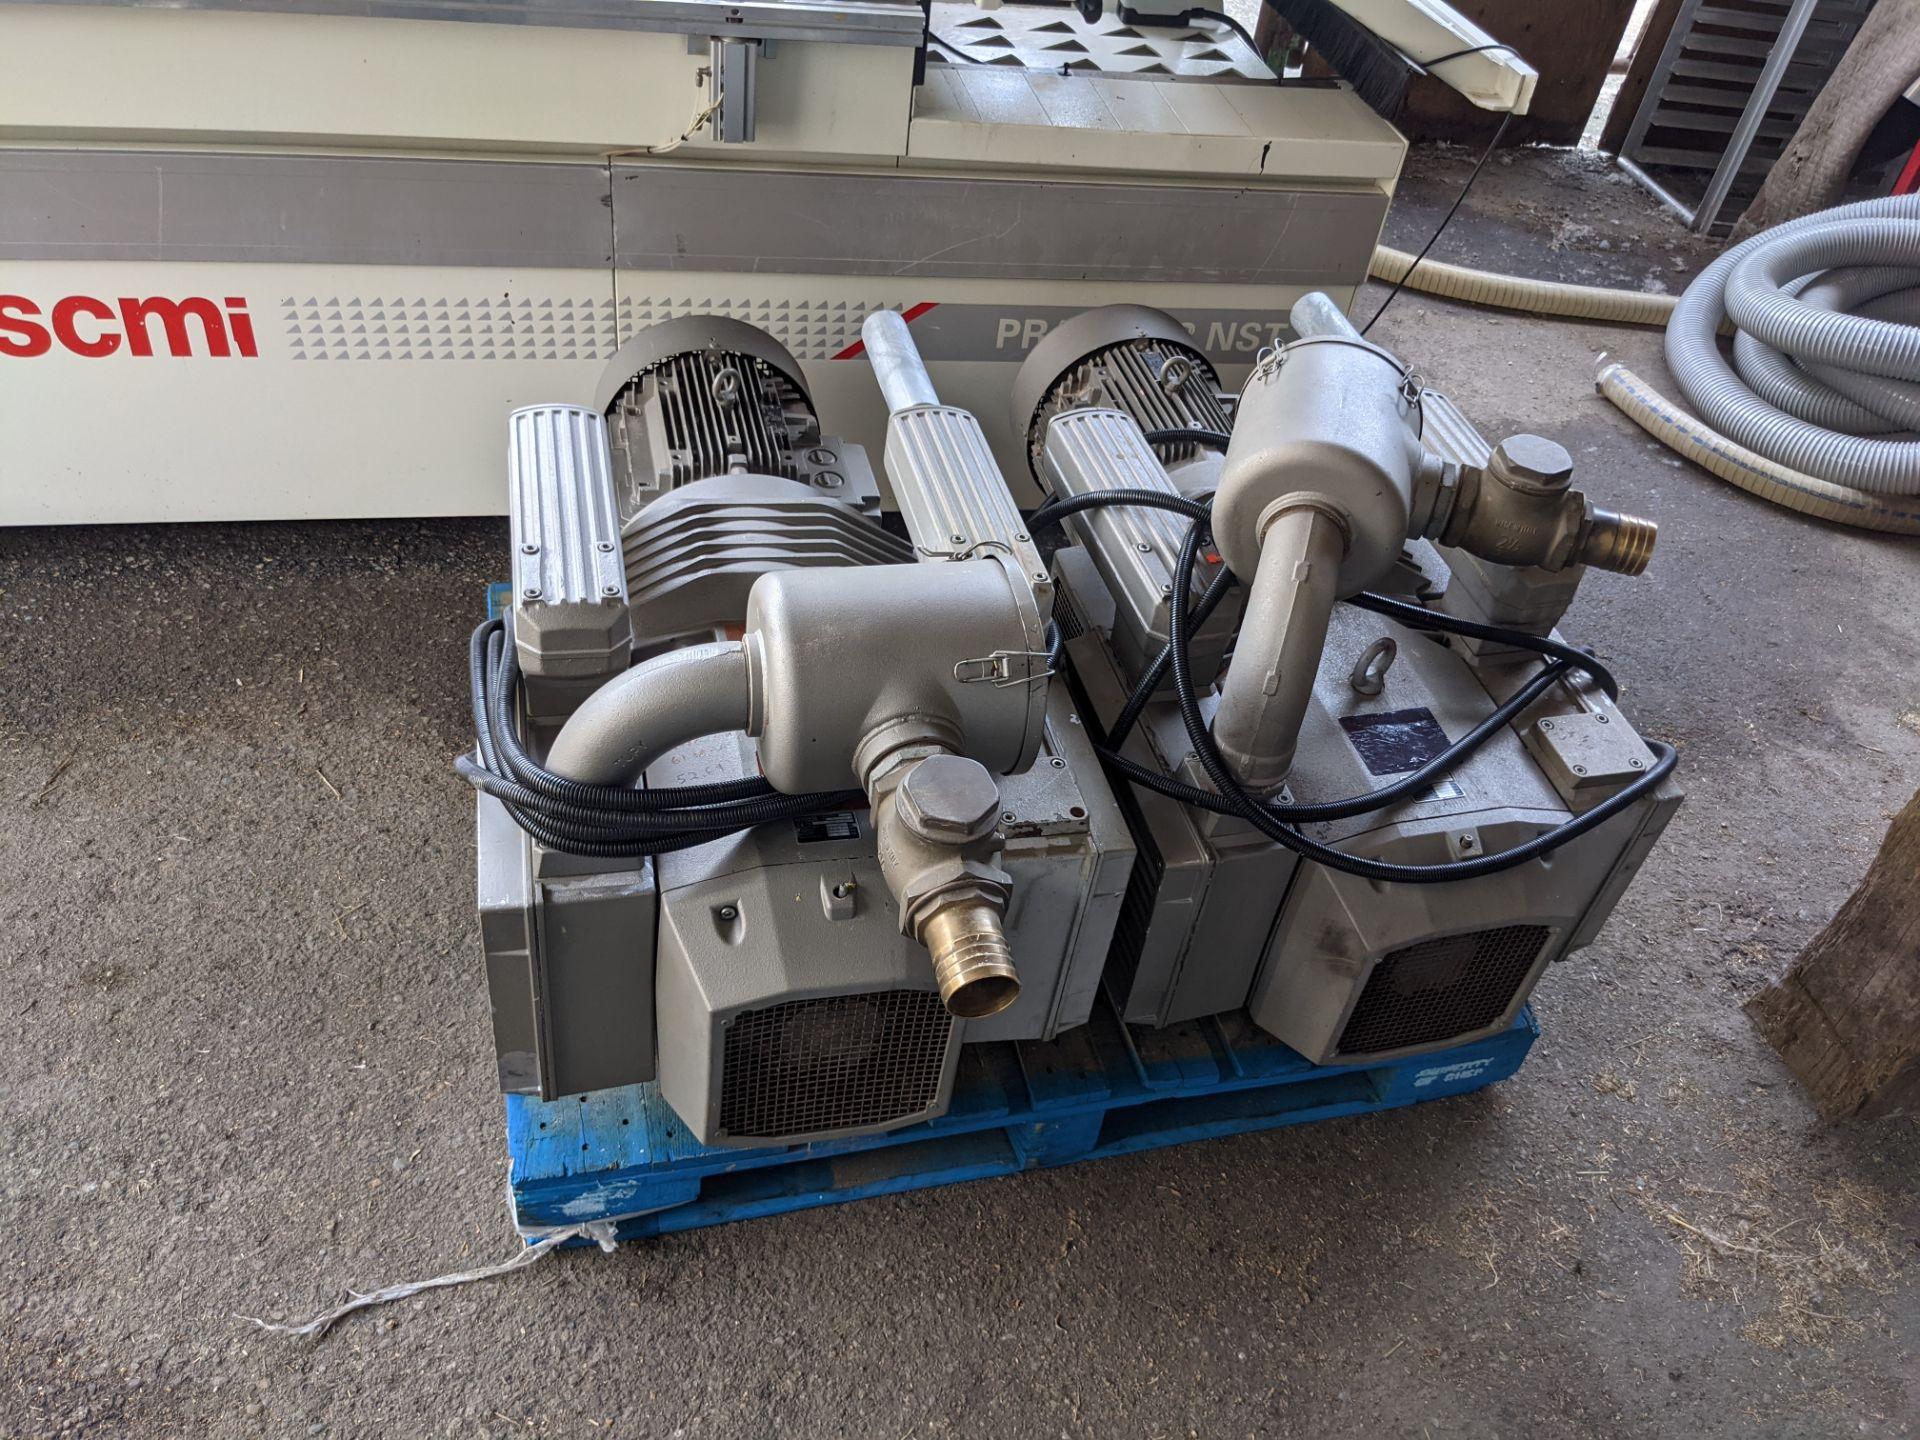 SCM PRATIX 48 NST CNC Nesting Machine with 2 Transformers and 2 Vacuum Pumps - Image 3 of 5